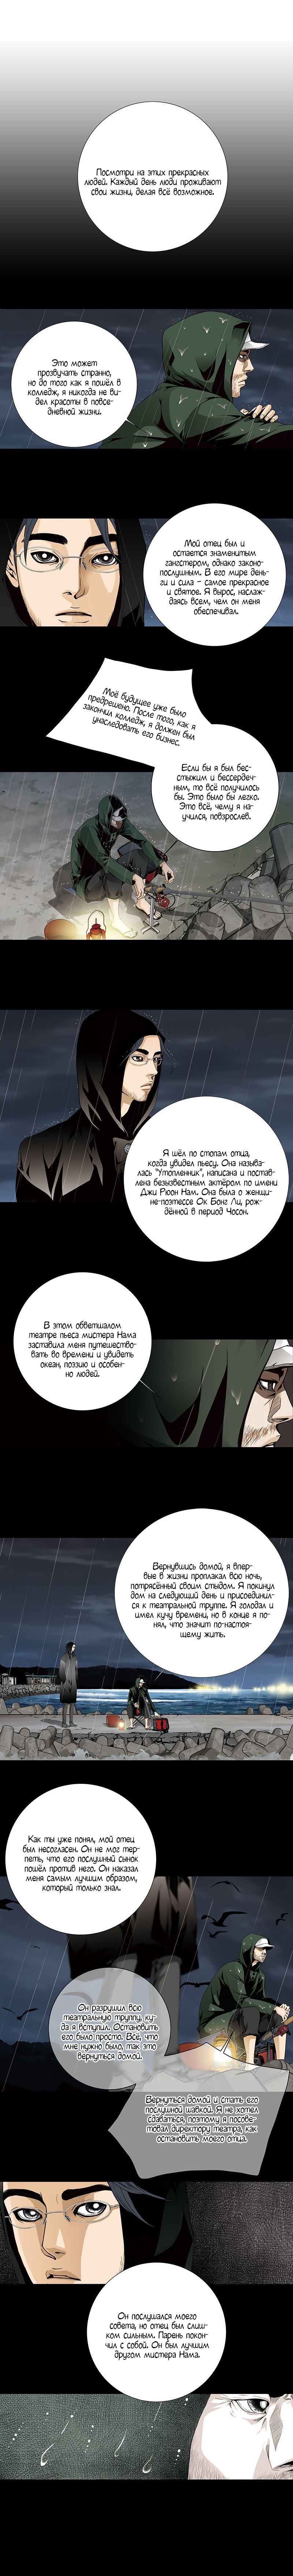 https://r1.ninemanga.com/comics/pic2/29/28573/344345/1512078930497.jpg Page 4